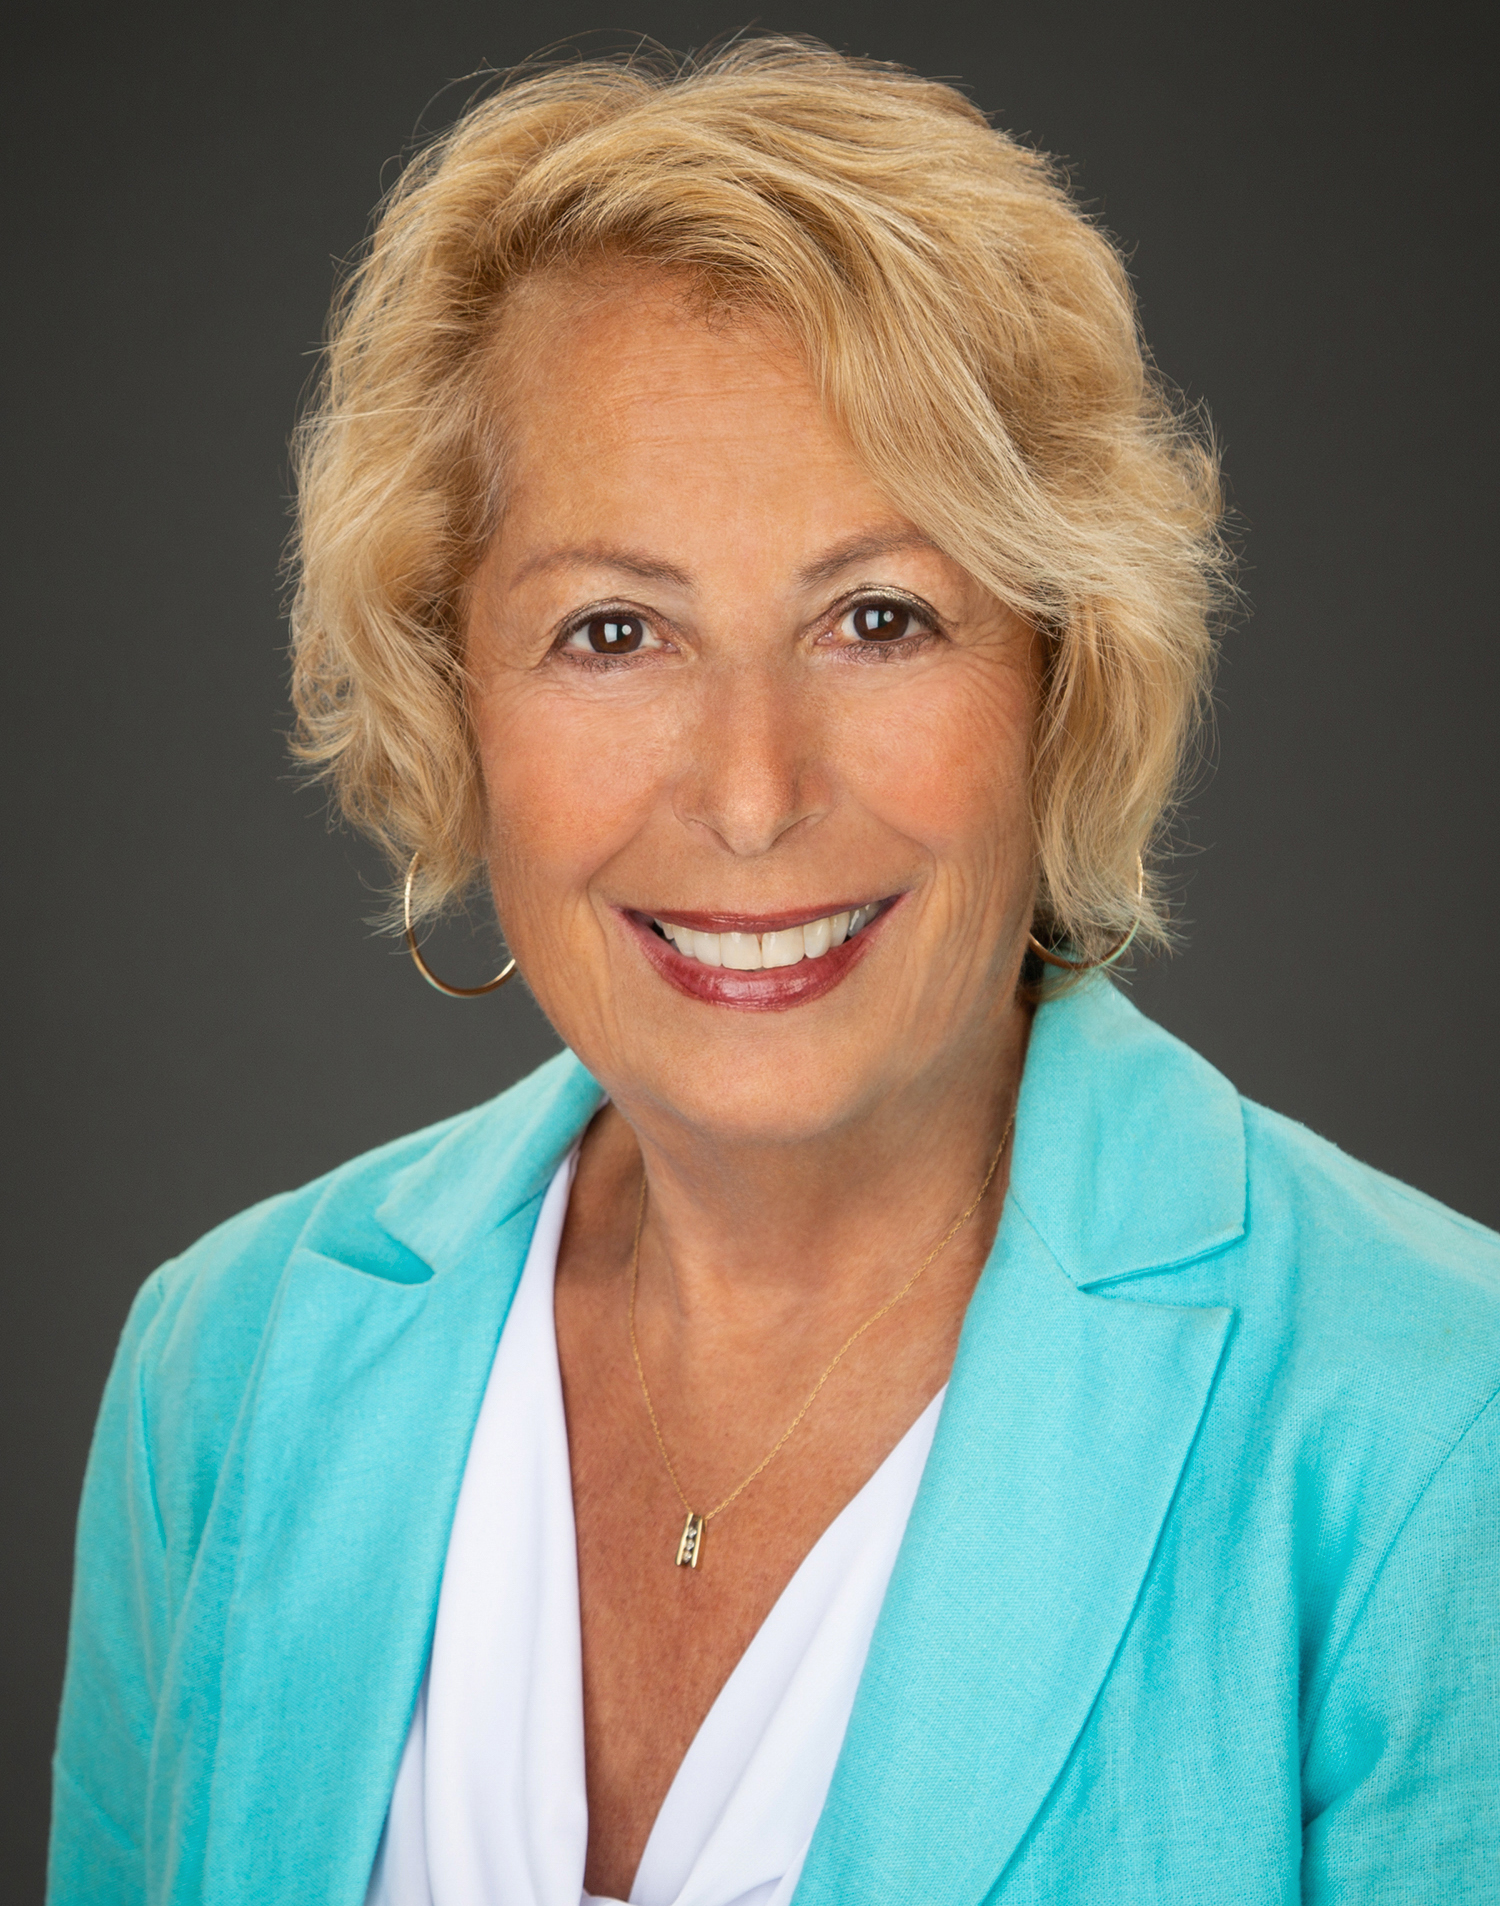 Carole Gold